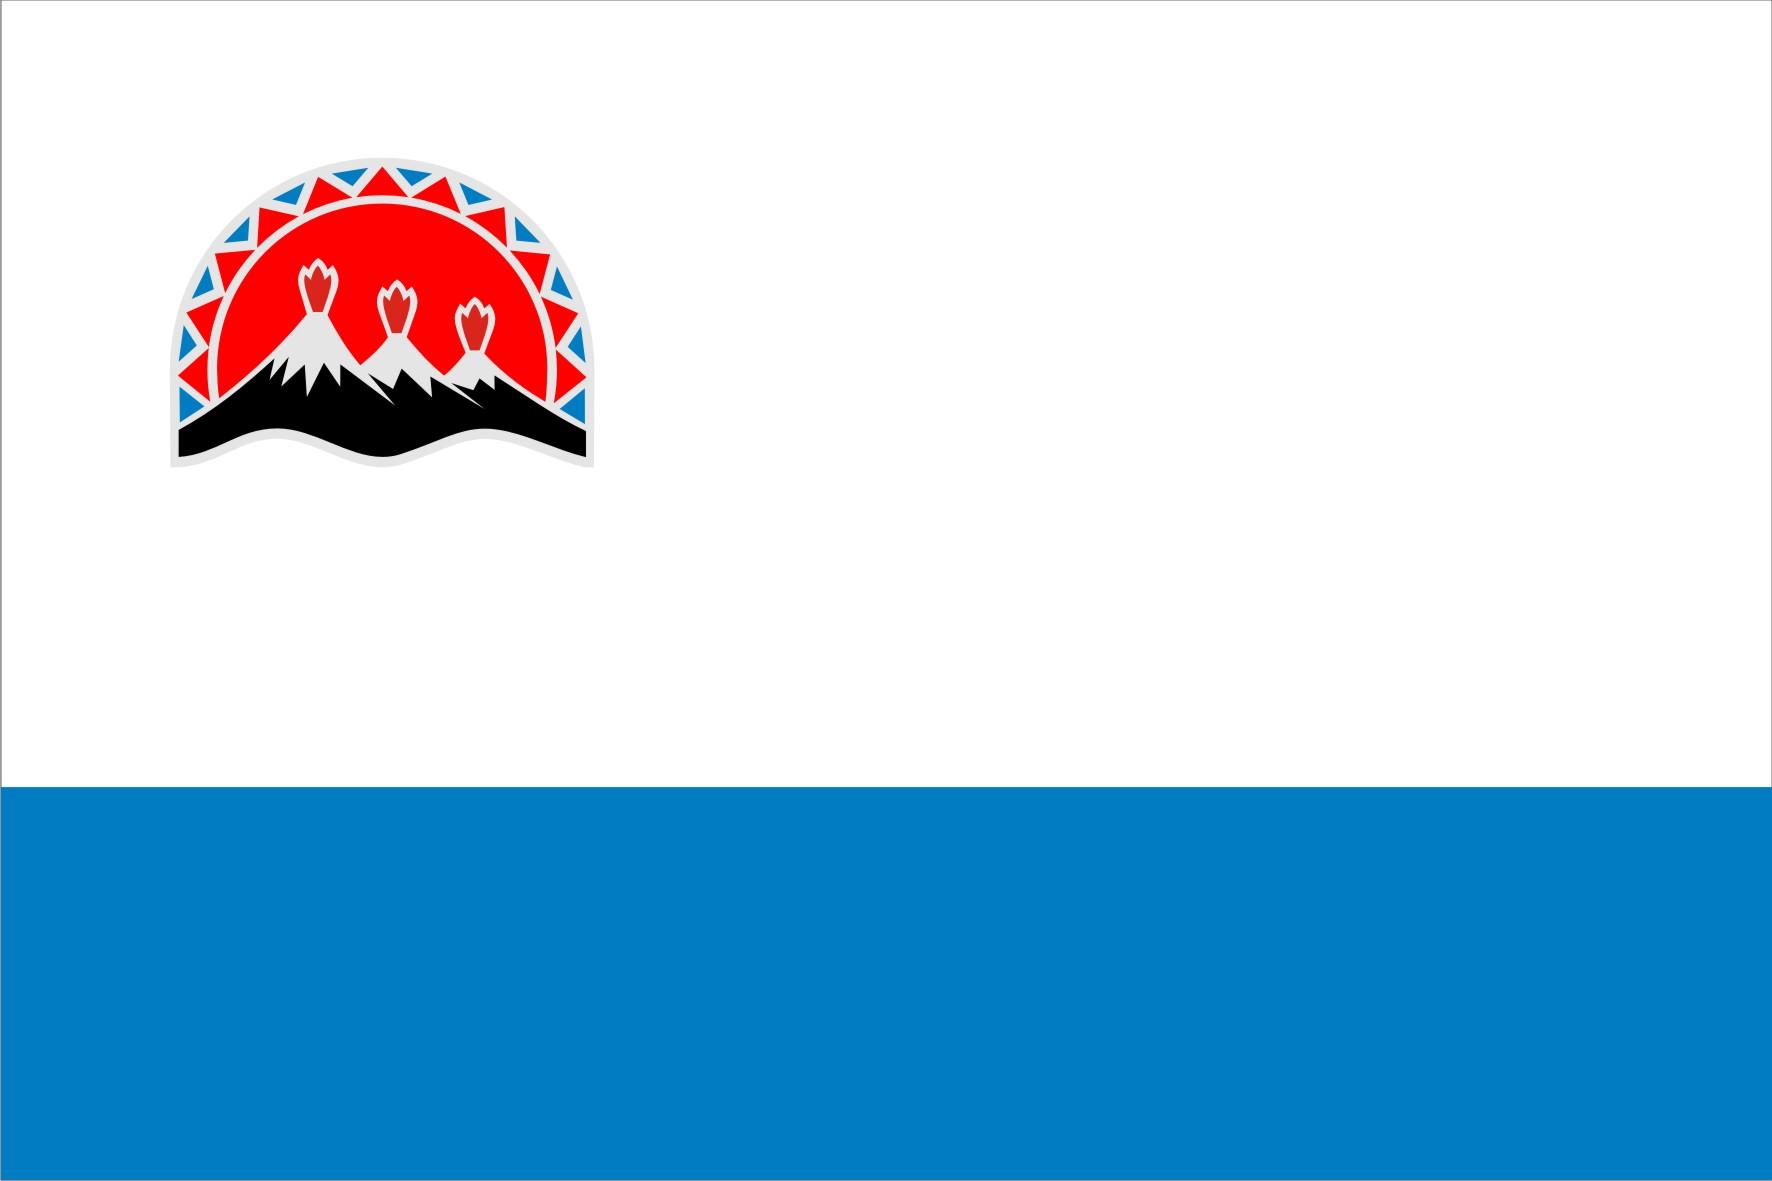 камчатского края фото